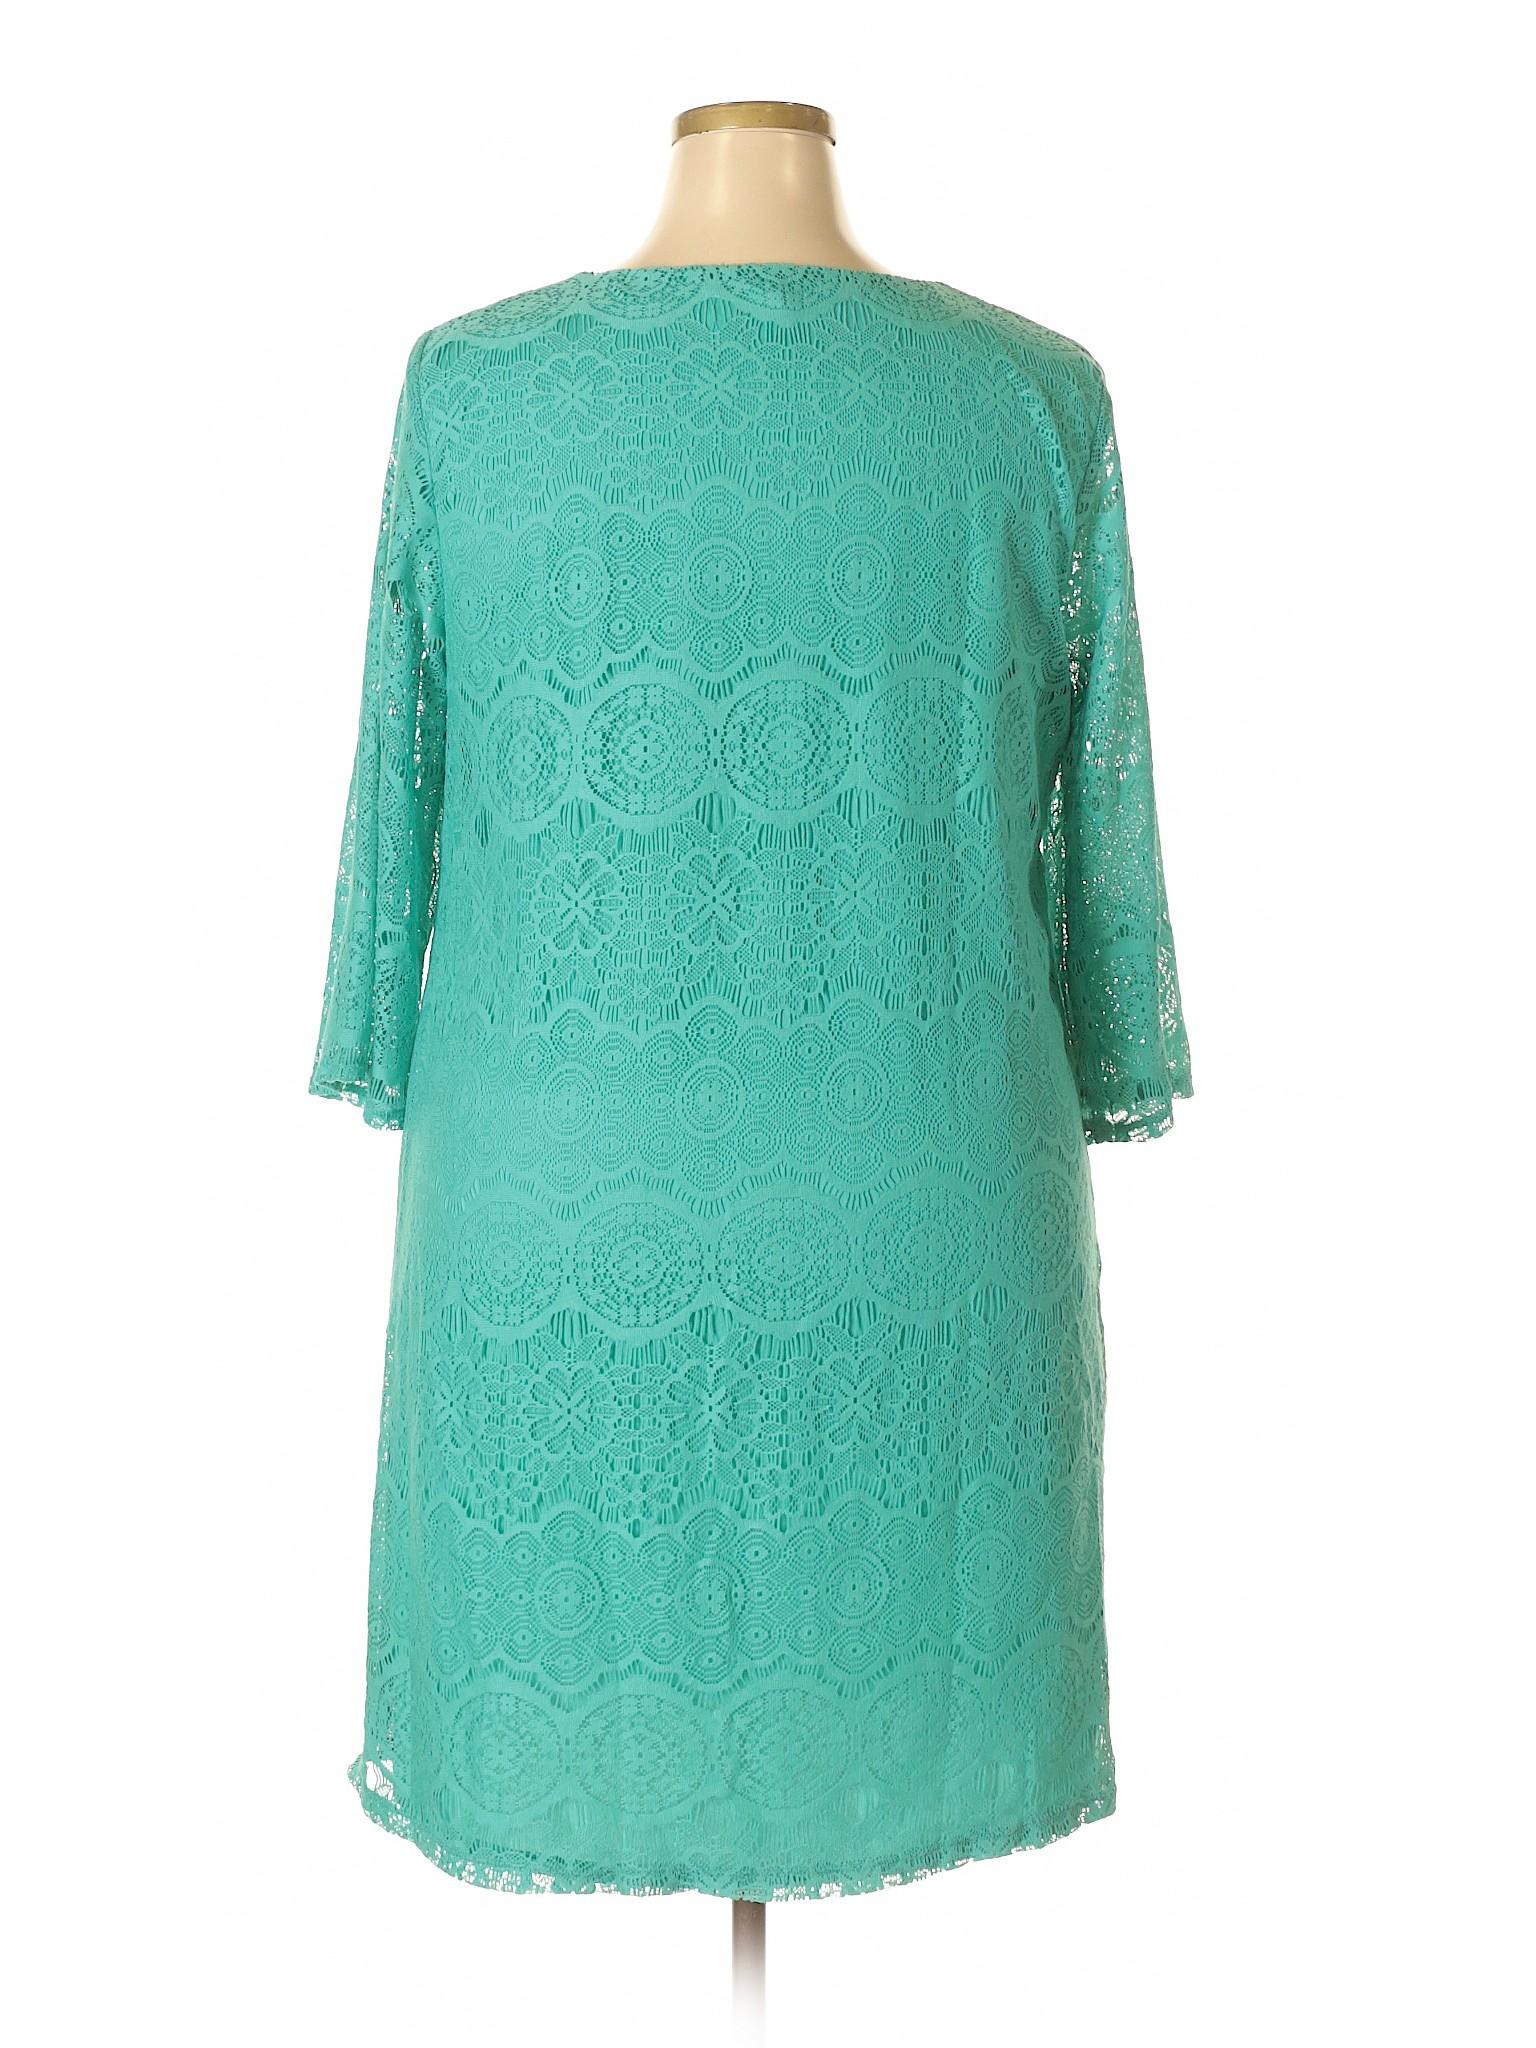 Boutique Casual Boutique Dress winter winter Tacera wq0qaB